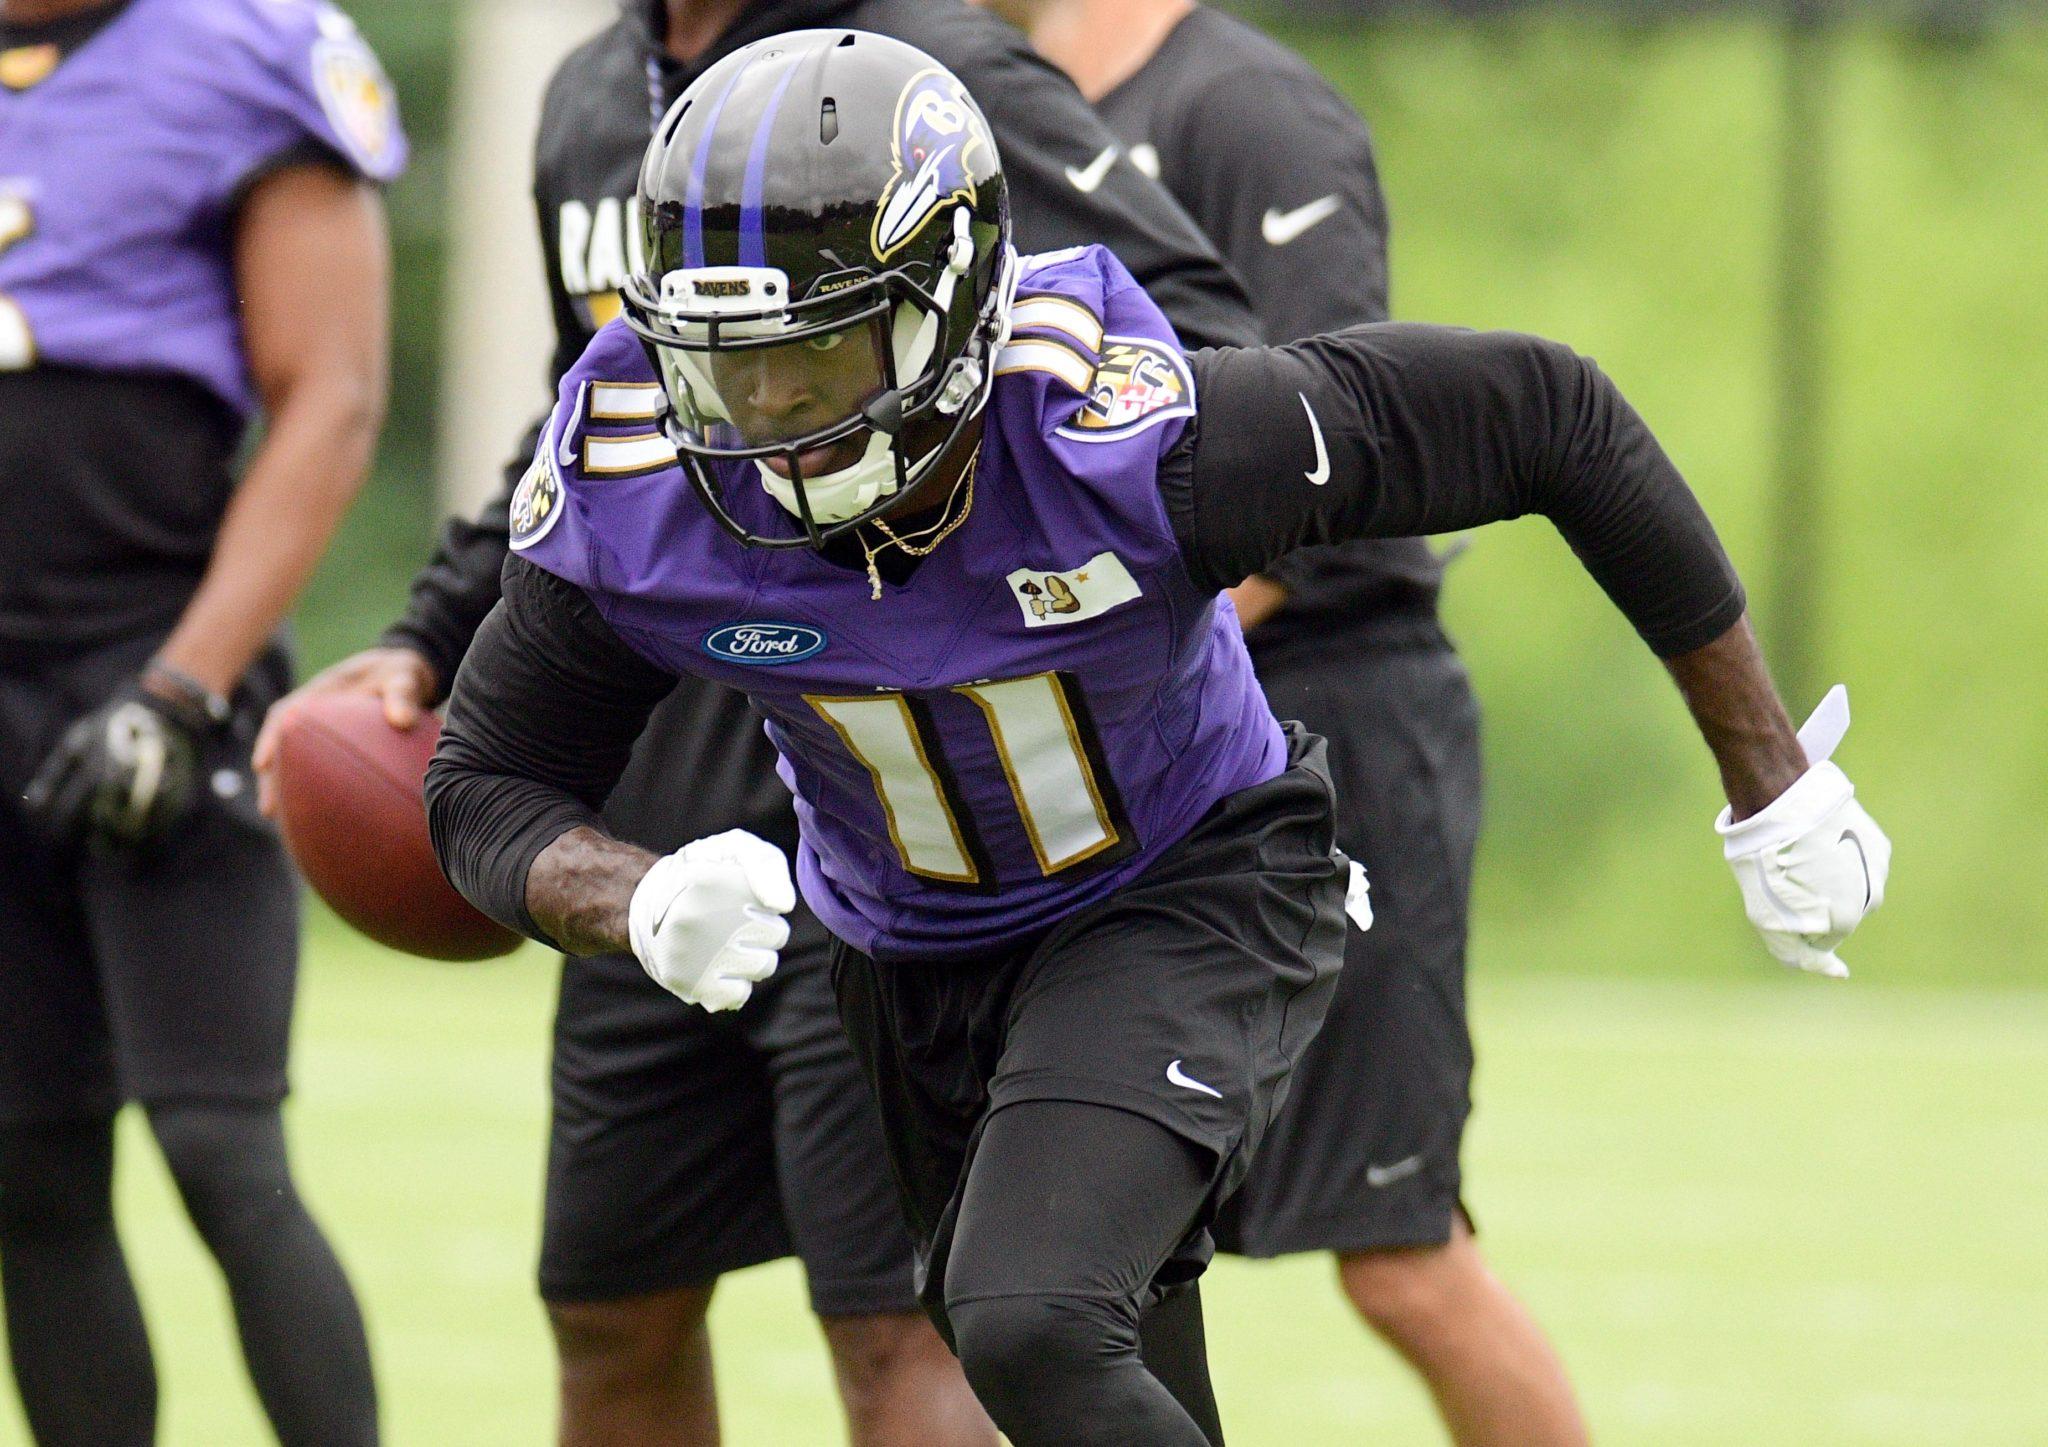 Baltimore Ravens WR Breshad Perriman